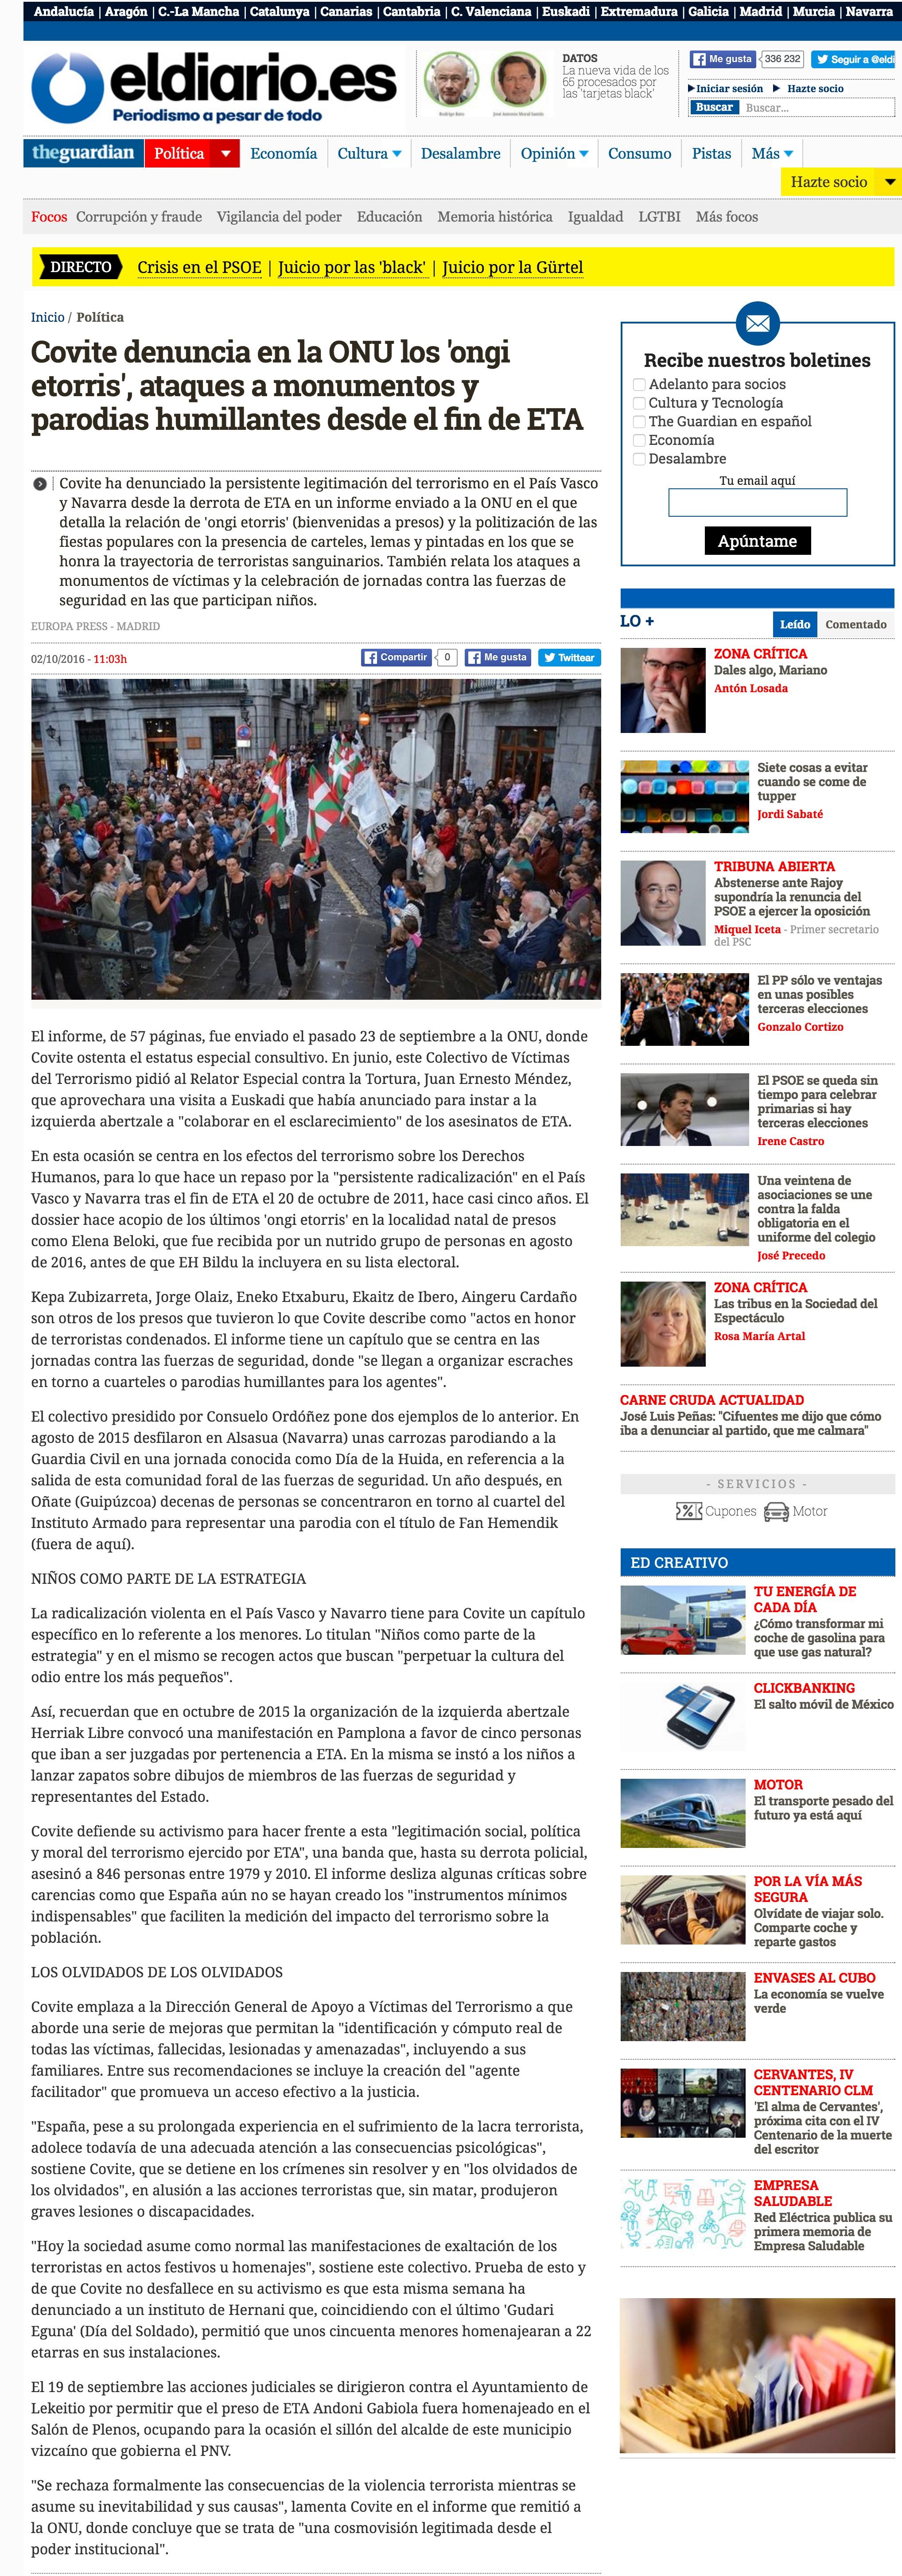 informe_eldiario